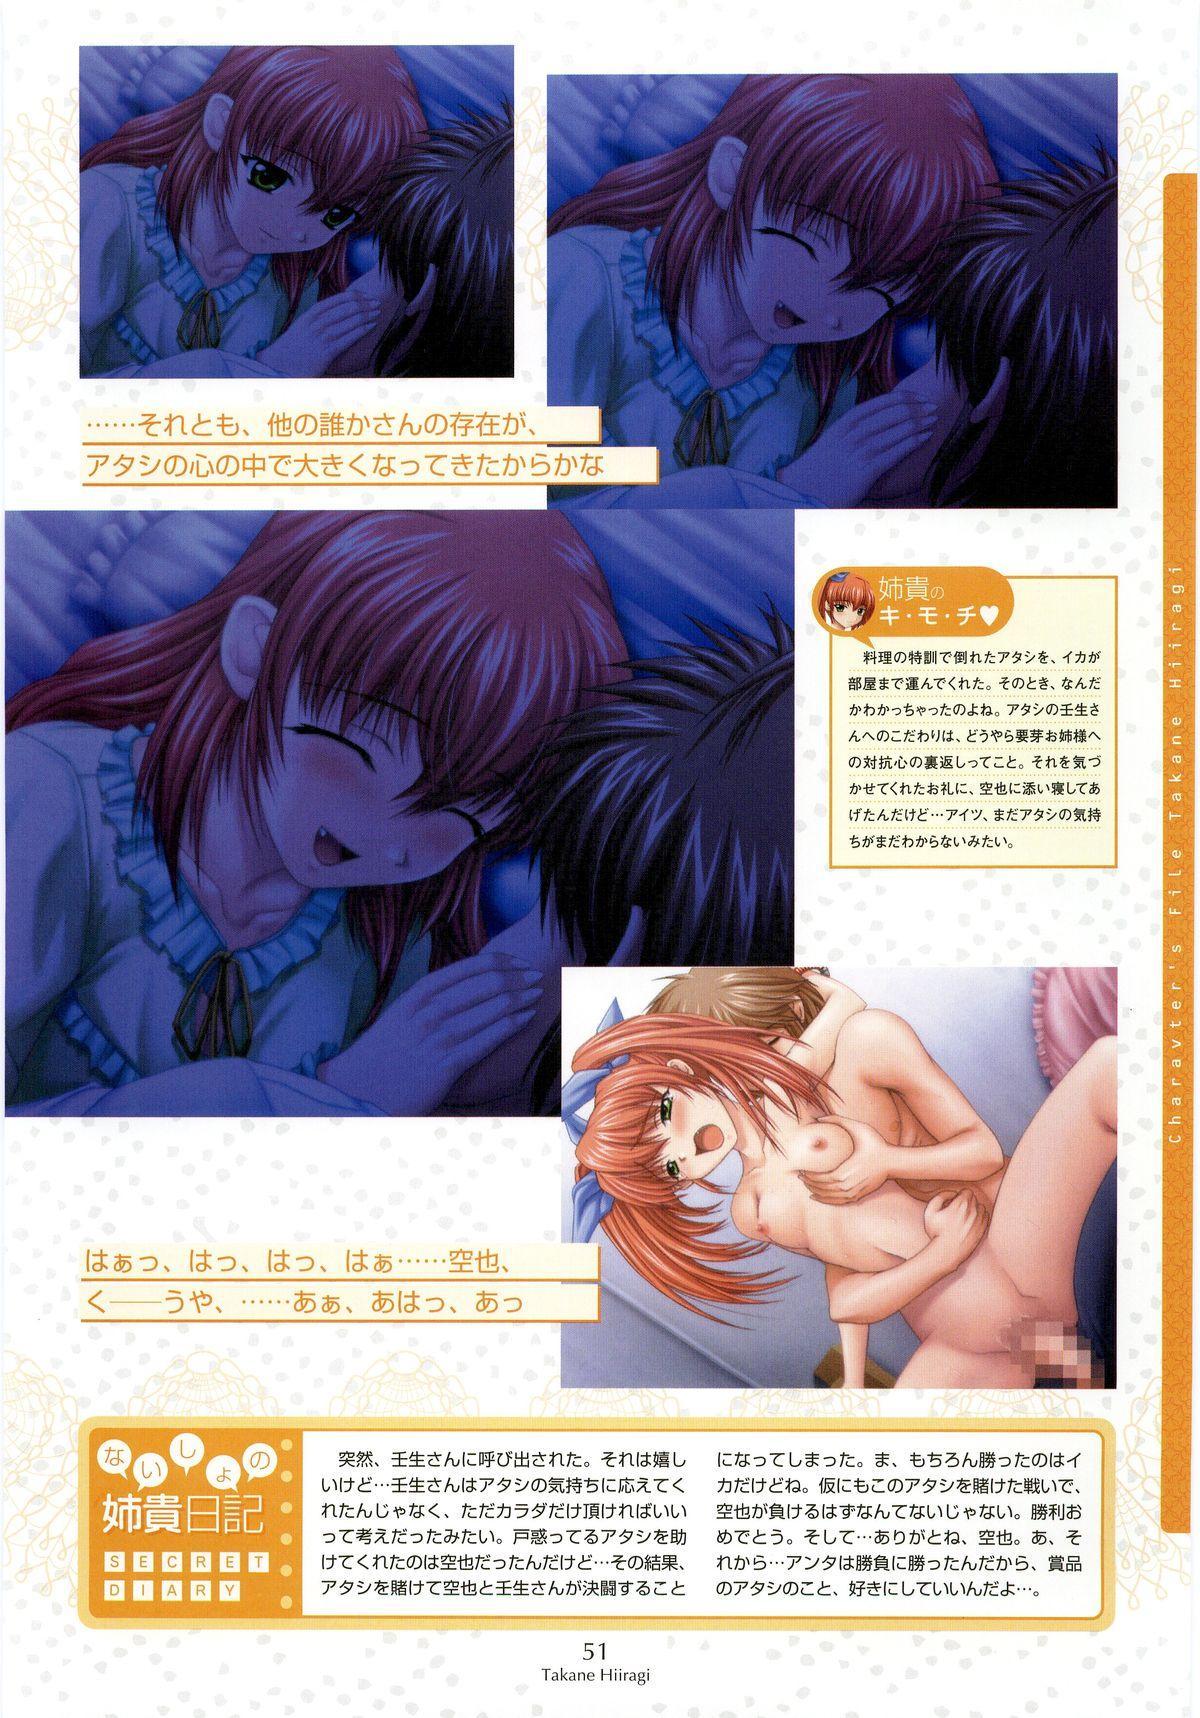 Nee, Chan to Shiyou yo! Koushiki Fanbook - Ai to Batou no Hibi 44